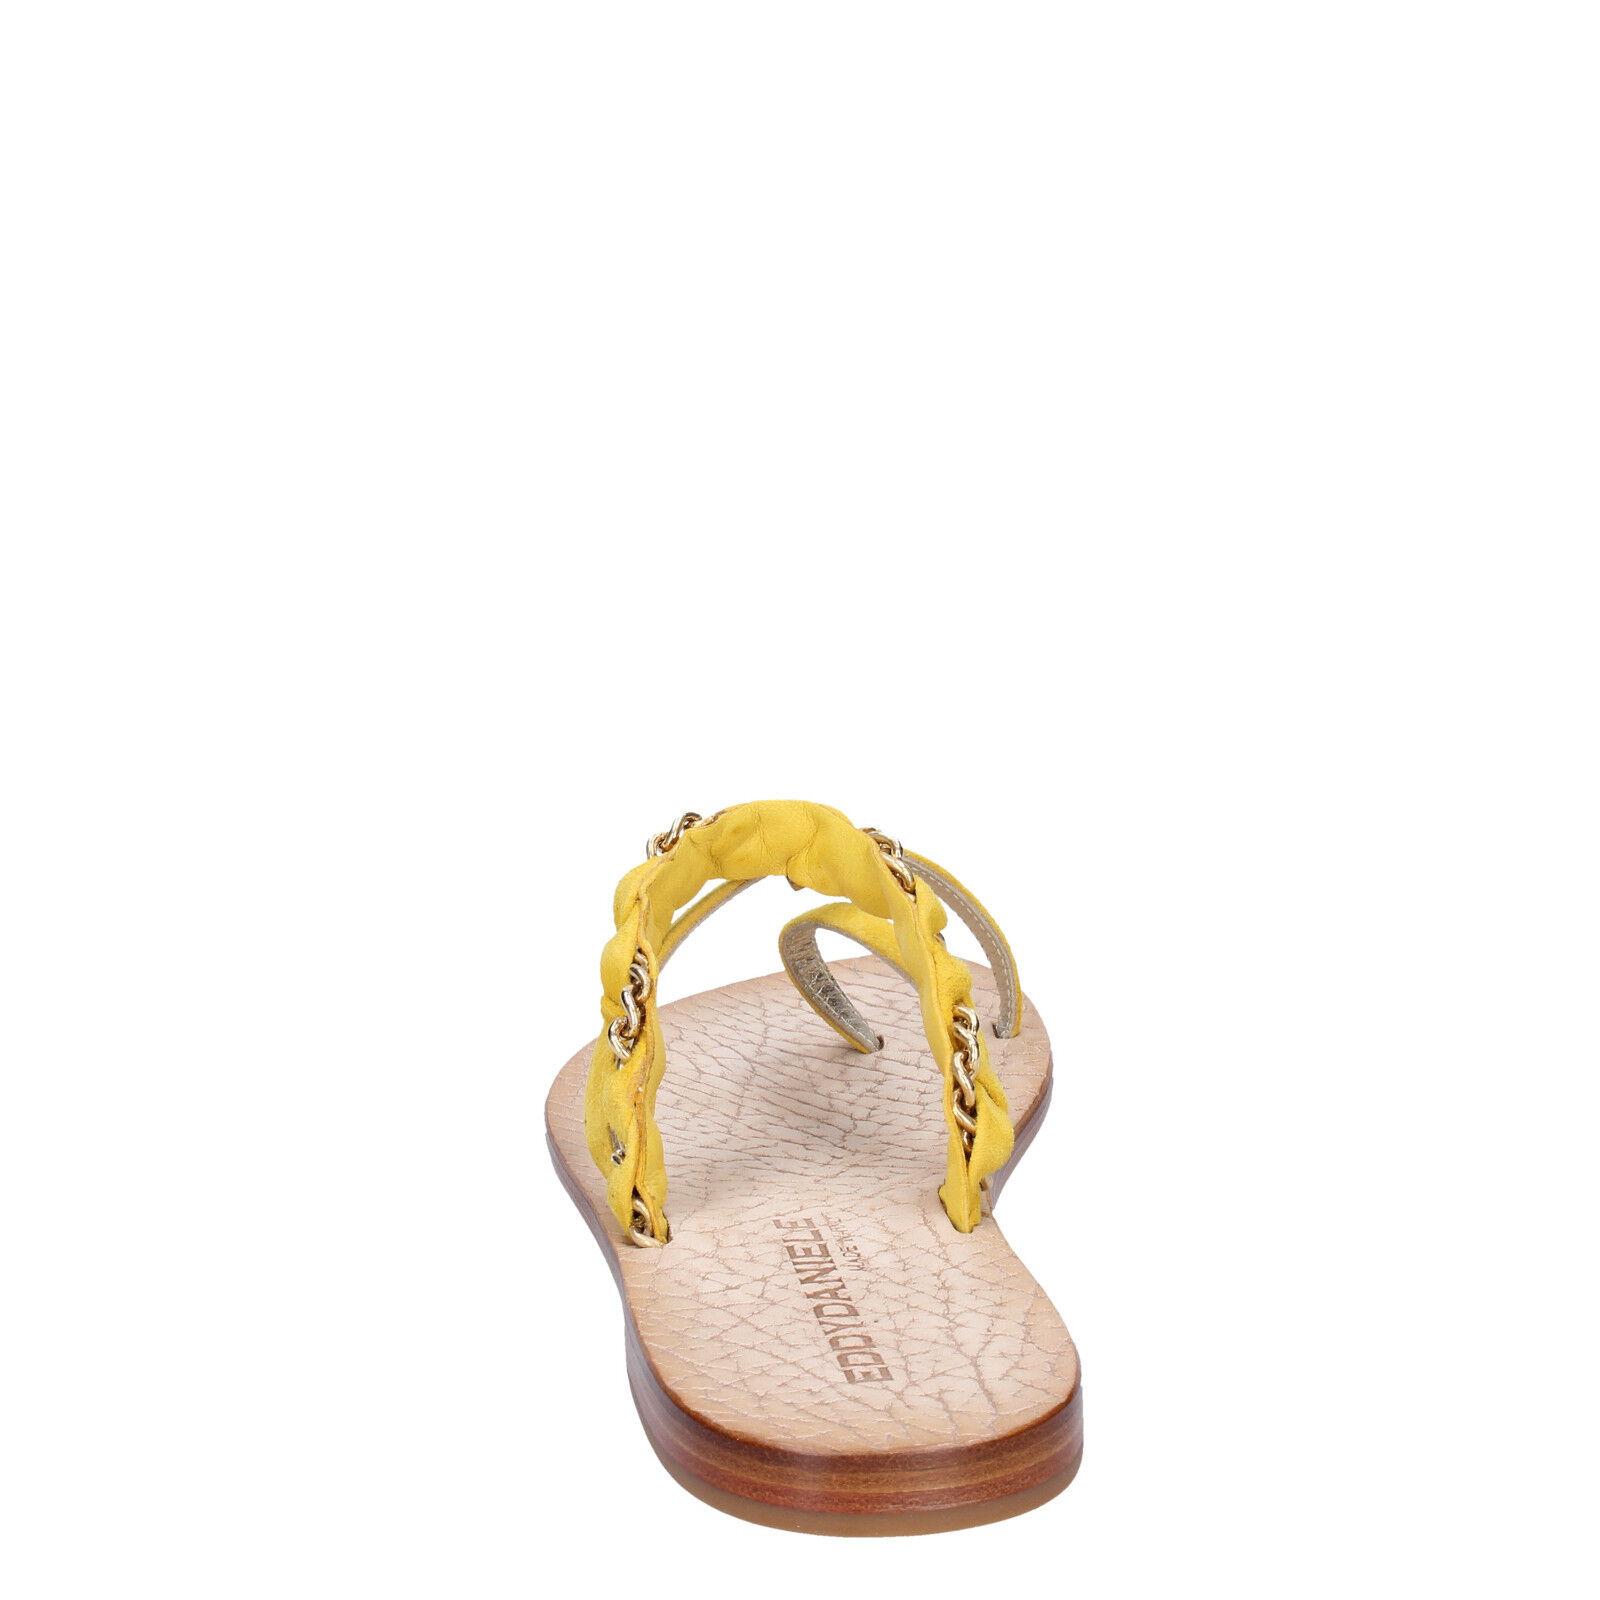 Damen schuhe EDDY 37 DANIELE 37 EDDY EU Sandale gelb wildleder AW311-37 52e2e6